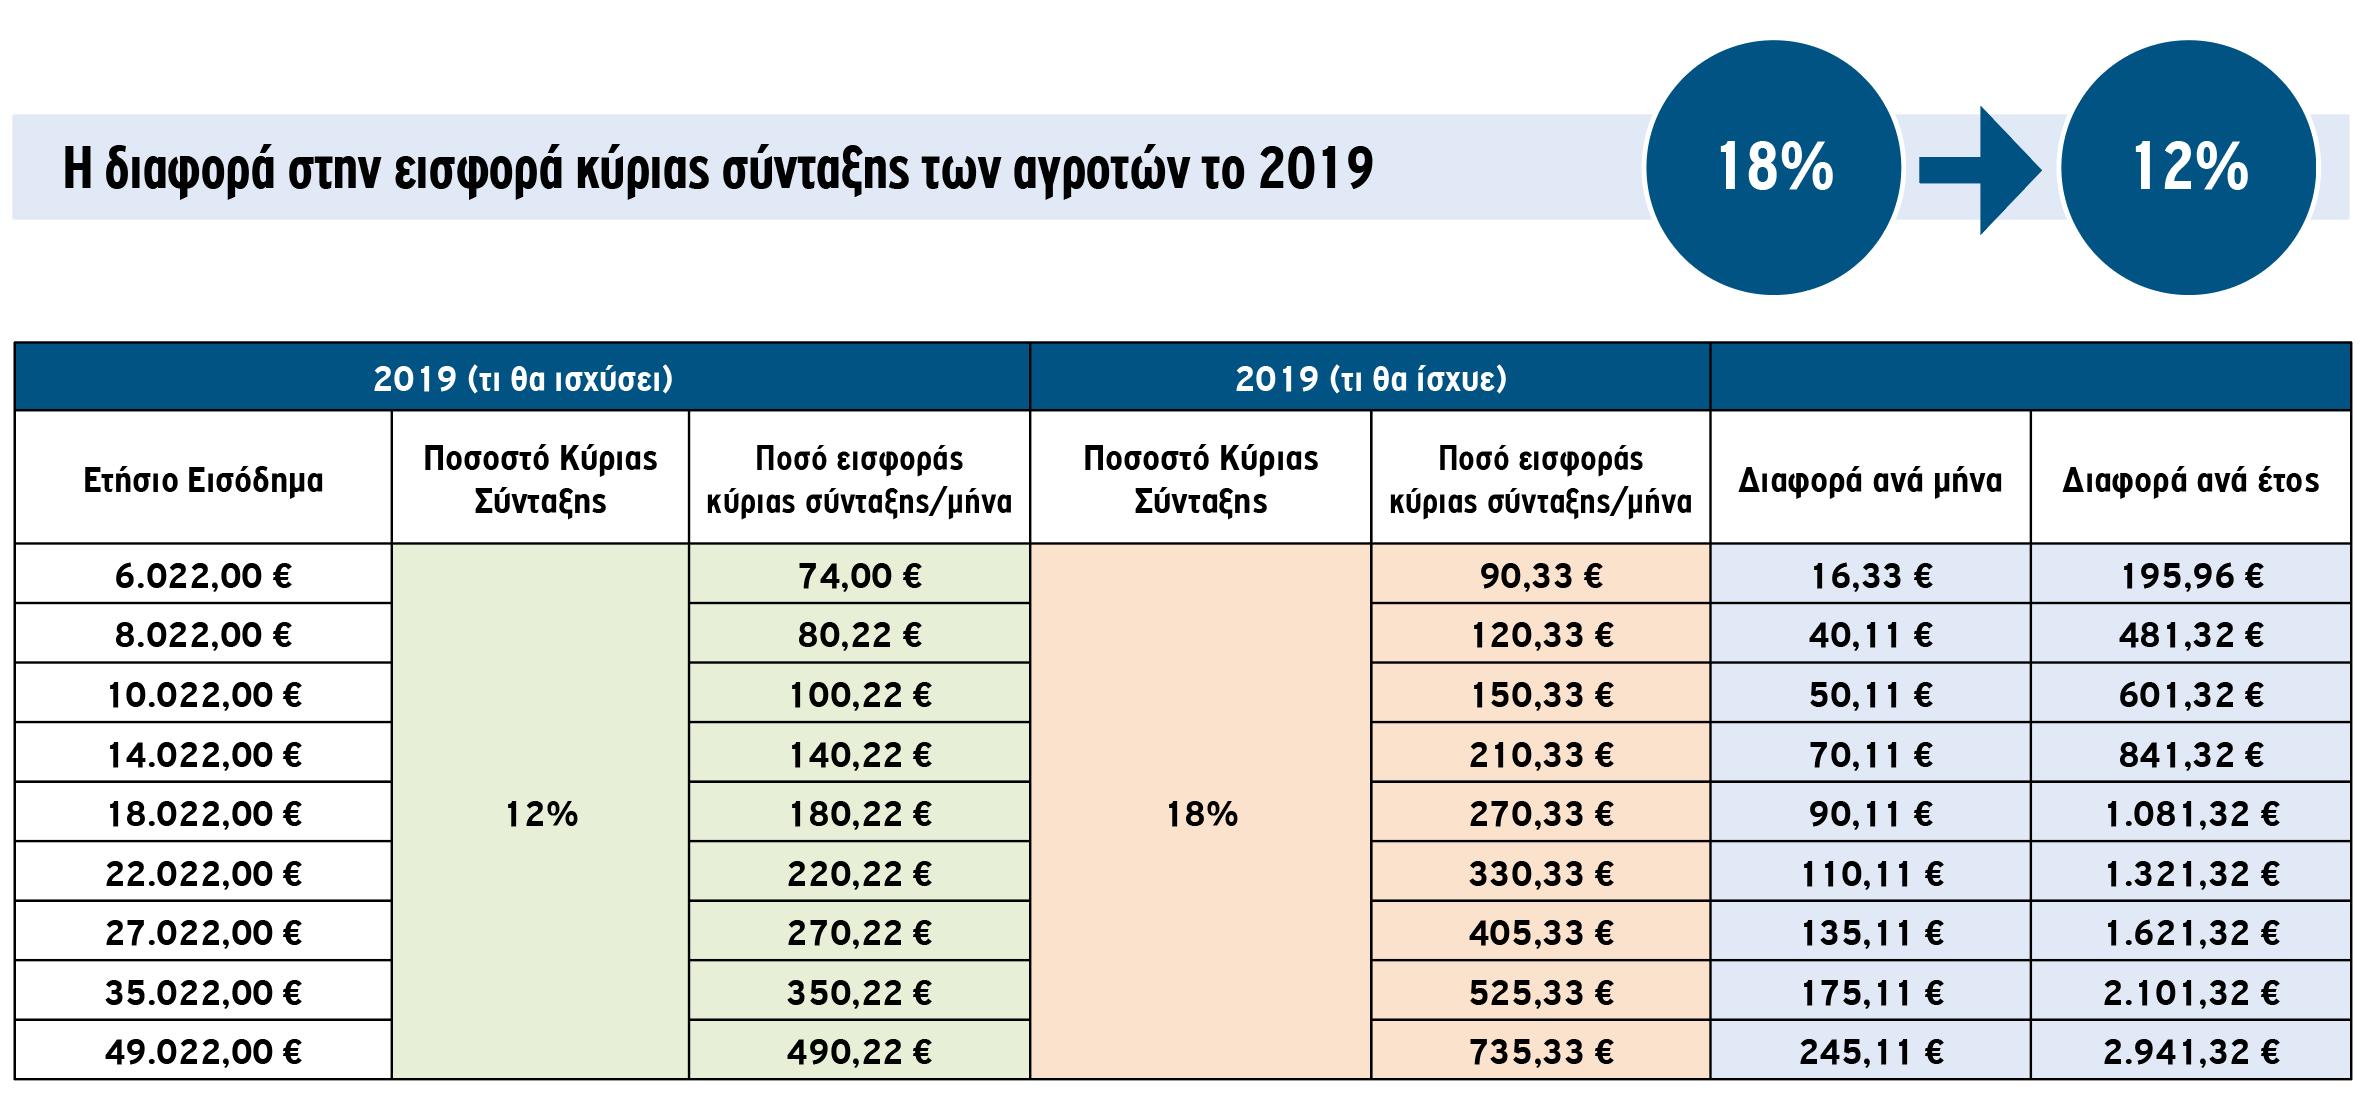 Mειωμένη κατά 33,3% η κύρια εισφορά αγροτών από το 2019, στη Βουλή το νομοσχέδιο (upd)